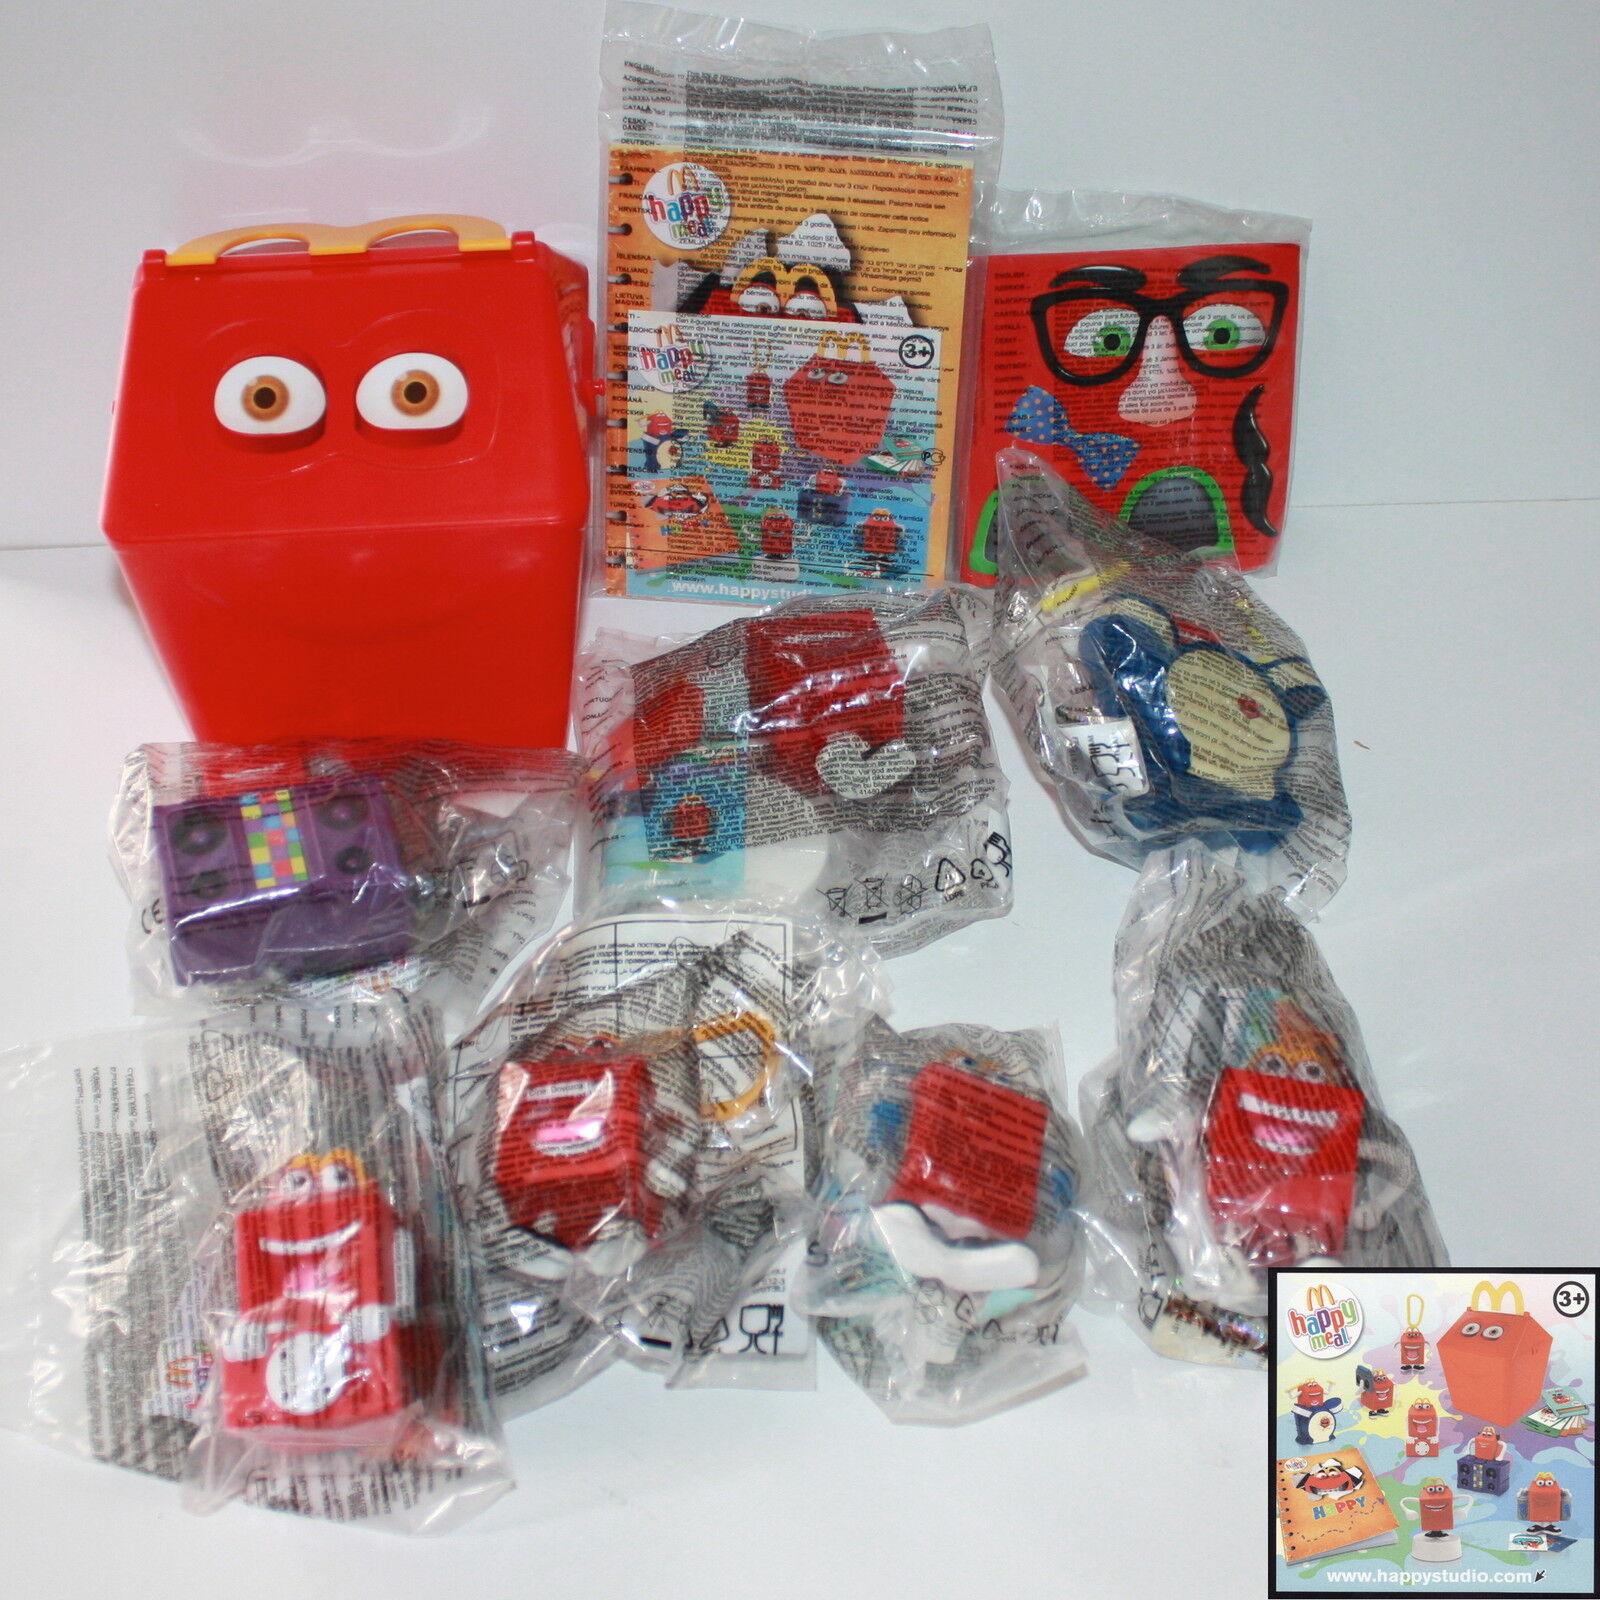 McDonald's Mc Donald's Happy Meal - 2011 Bag Red Studio Complete series the